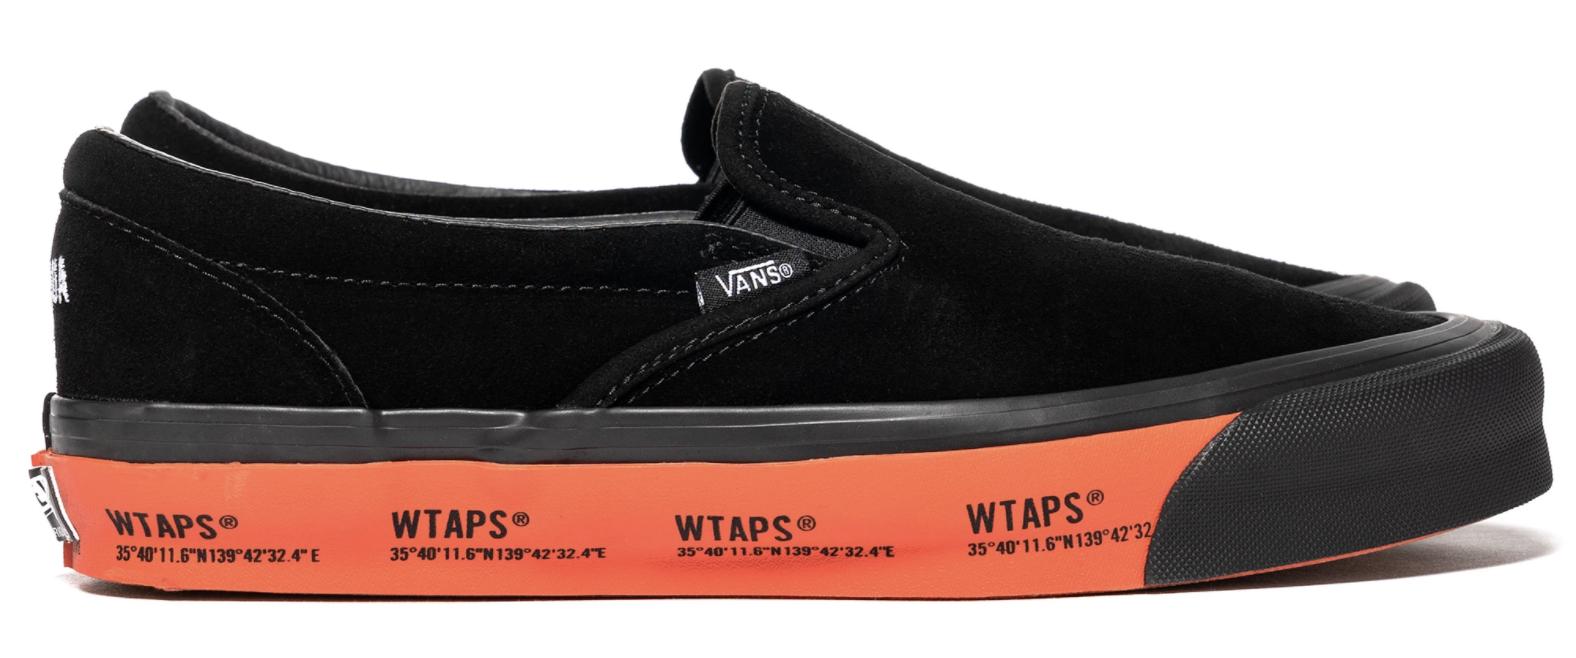 Vans Slip-On WTAPS Black Orange